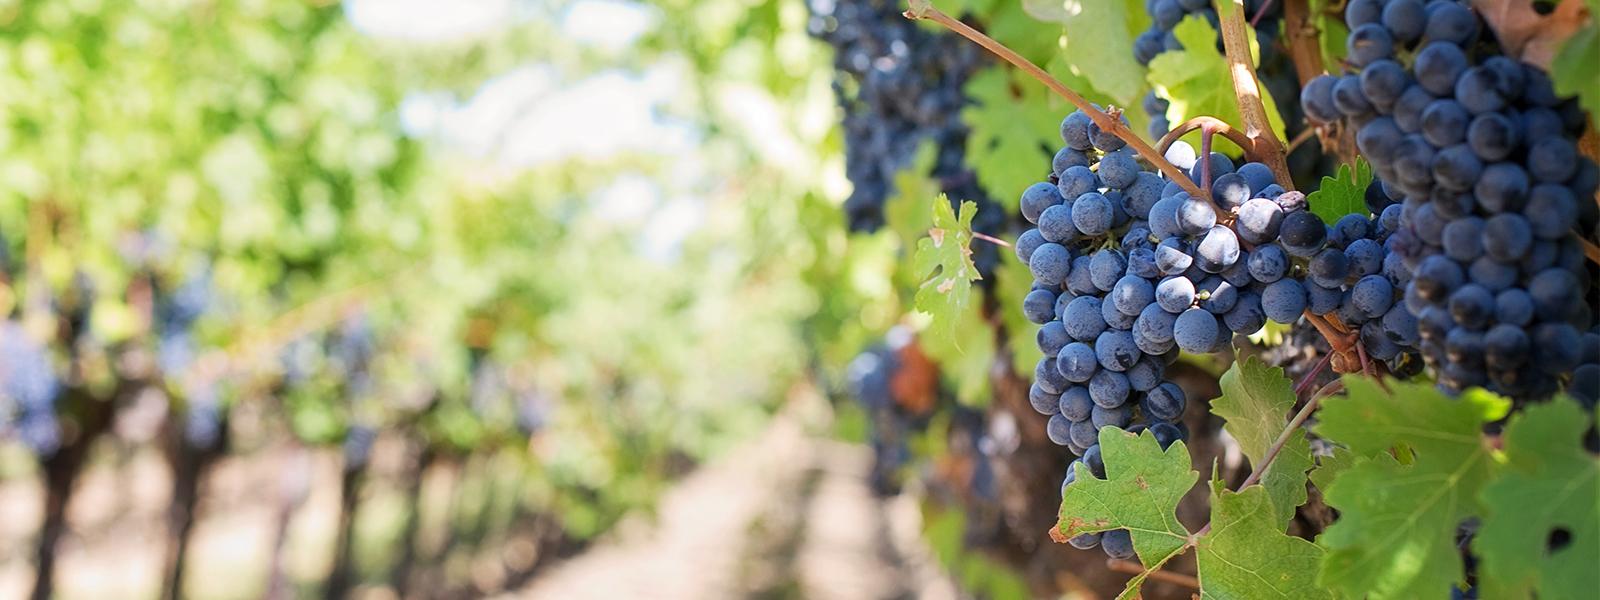 Vino sin alcohol surgió de un programa corporativo